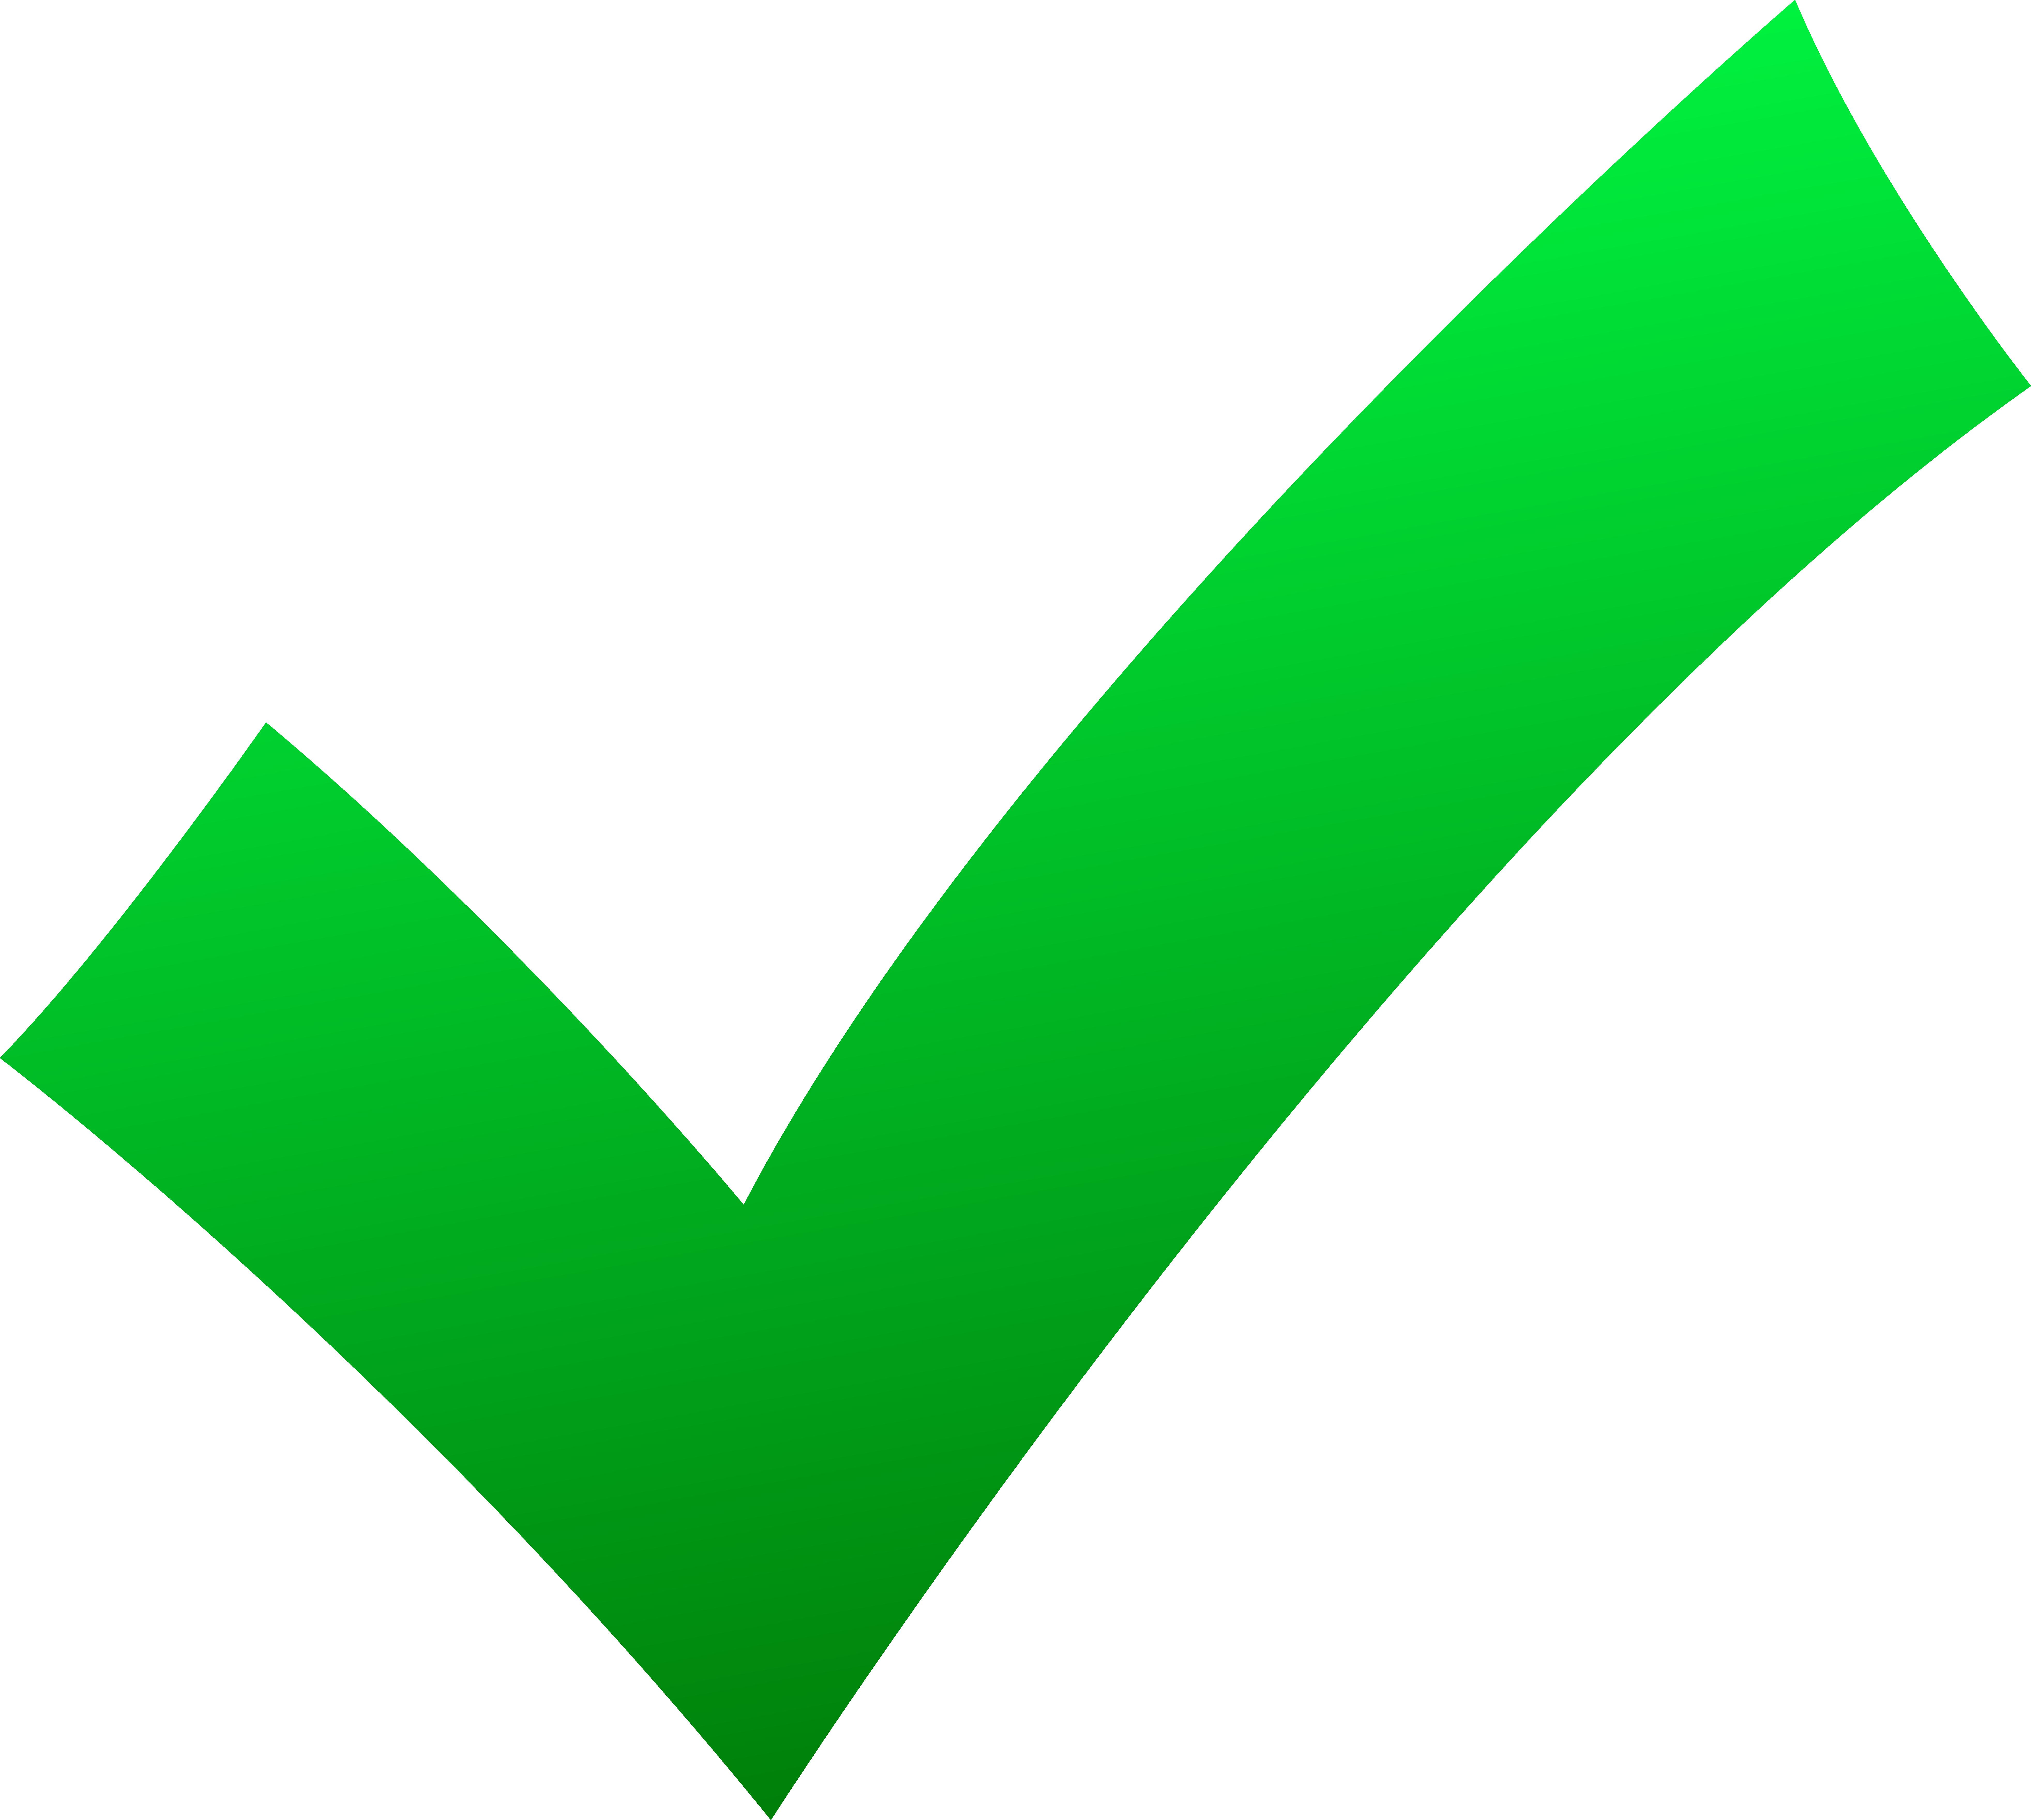 ... Free Clipart Check Mark Symbol ...-... Free clipart check mark symbol ...-12